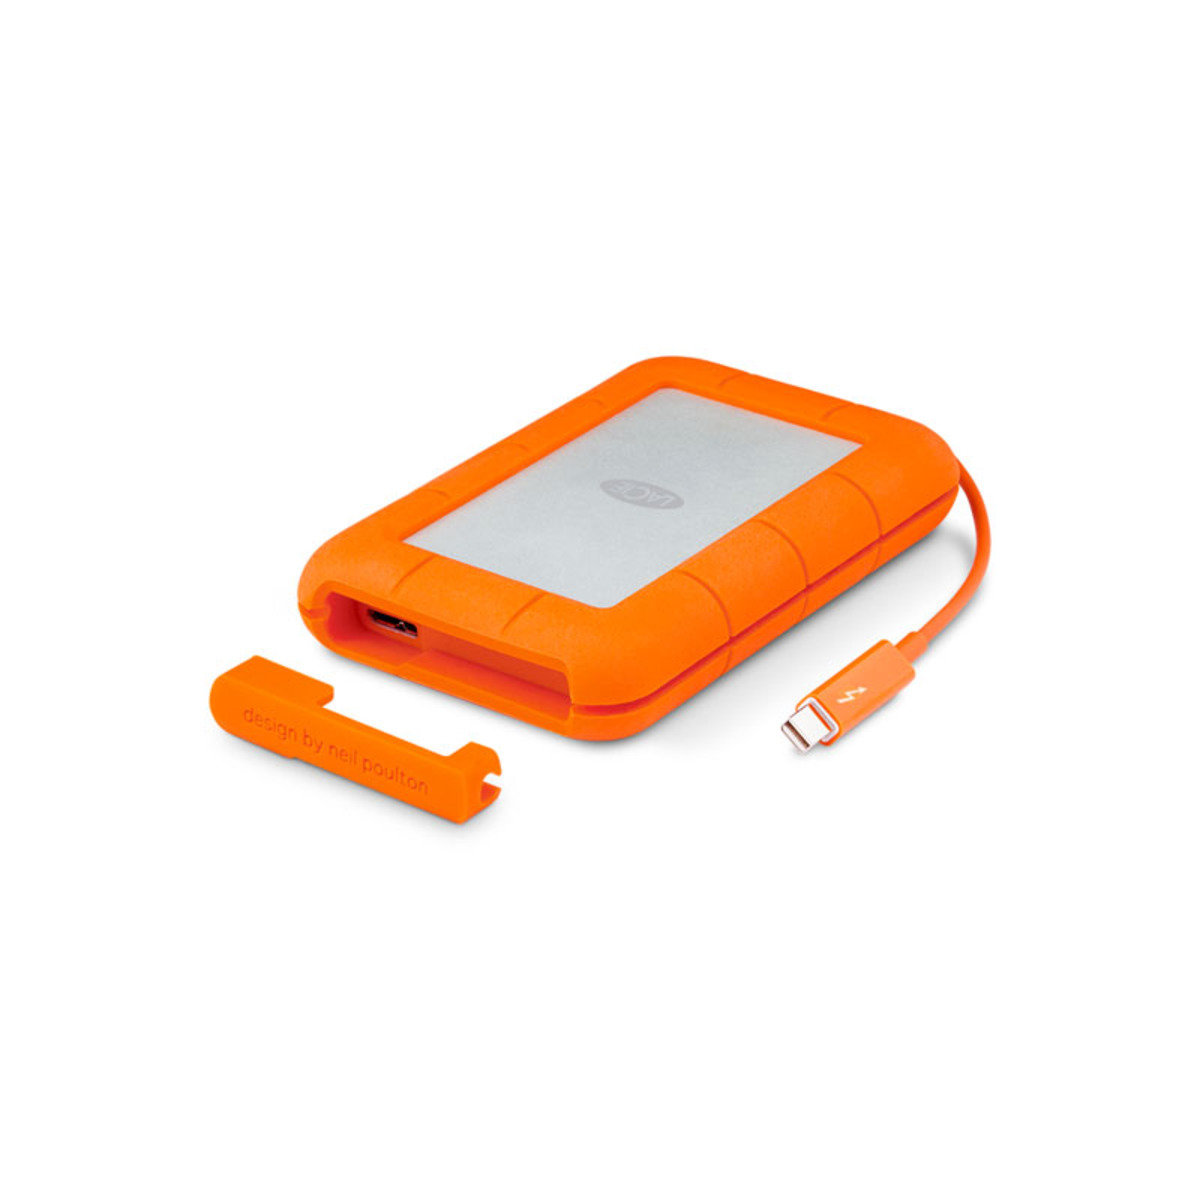 Rugged Thunderbolt 500GB SSD IP54防水防麈抗震外置硬碟 9000491